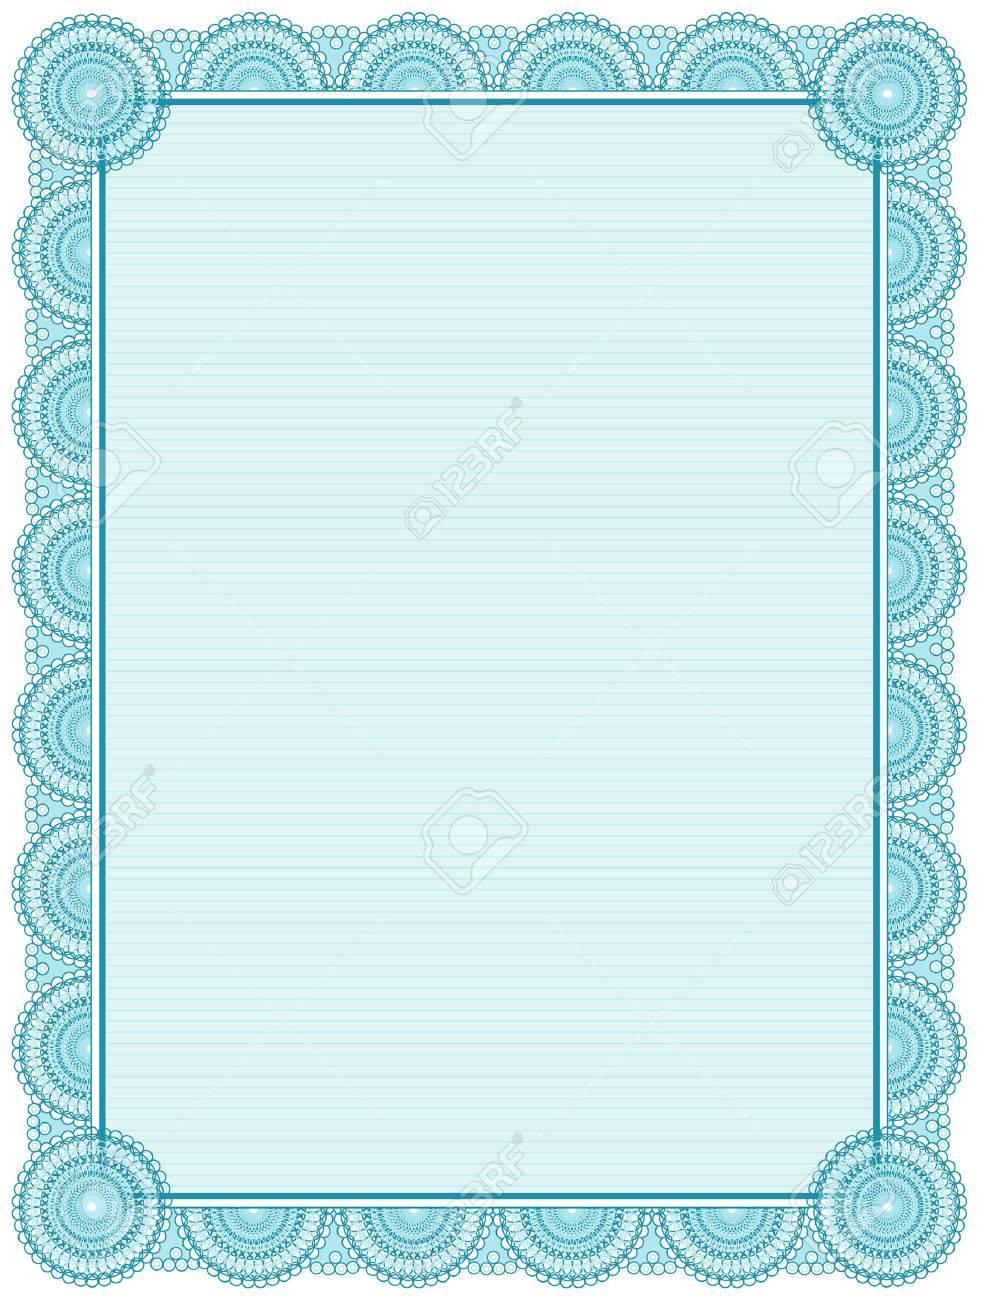 Blank Printable Certificate Frame Template Royalty Free Cliparts – Blank Worksheet Template